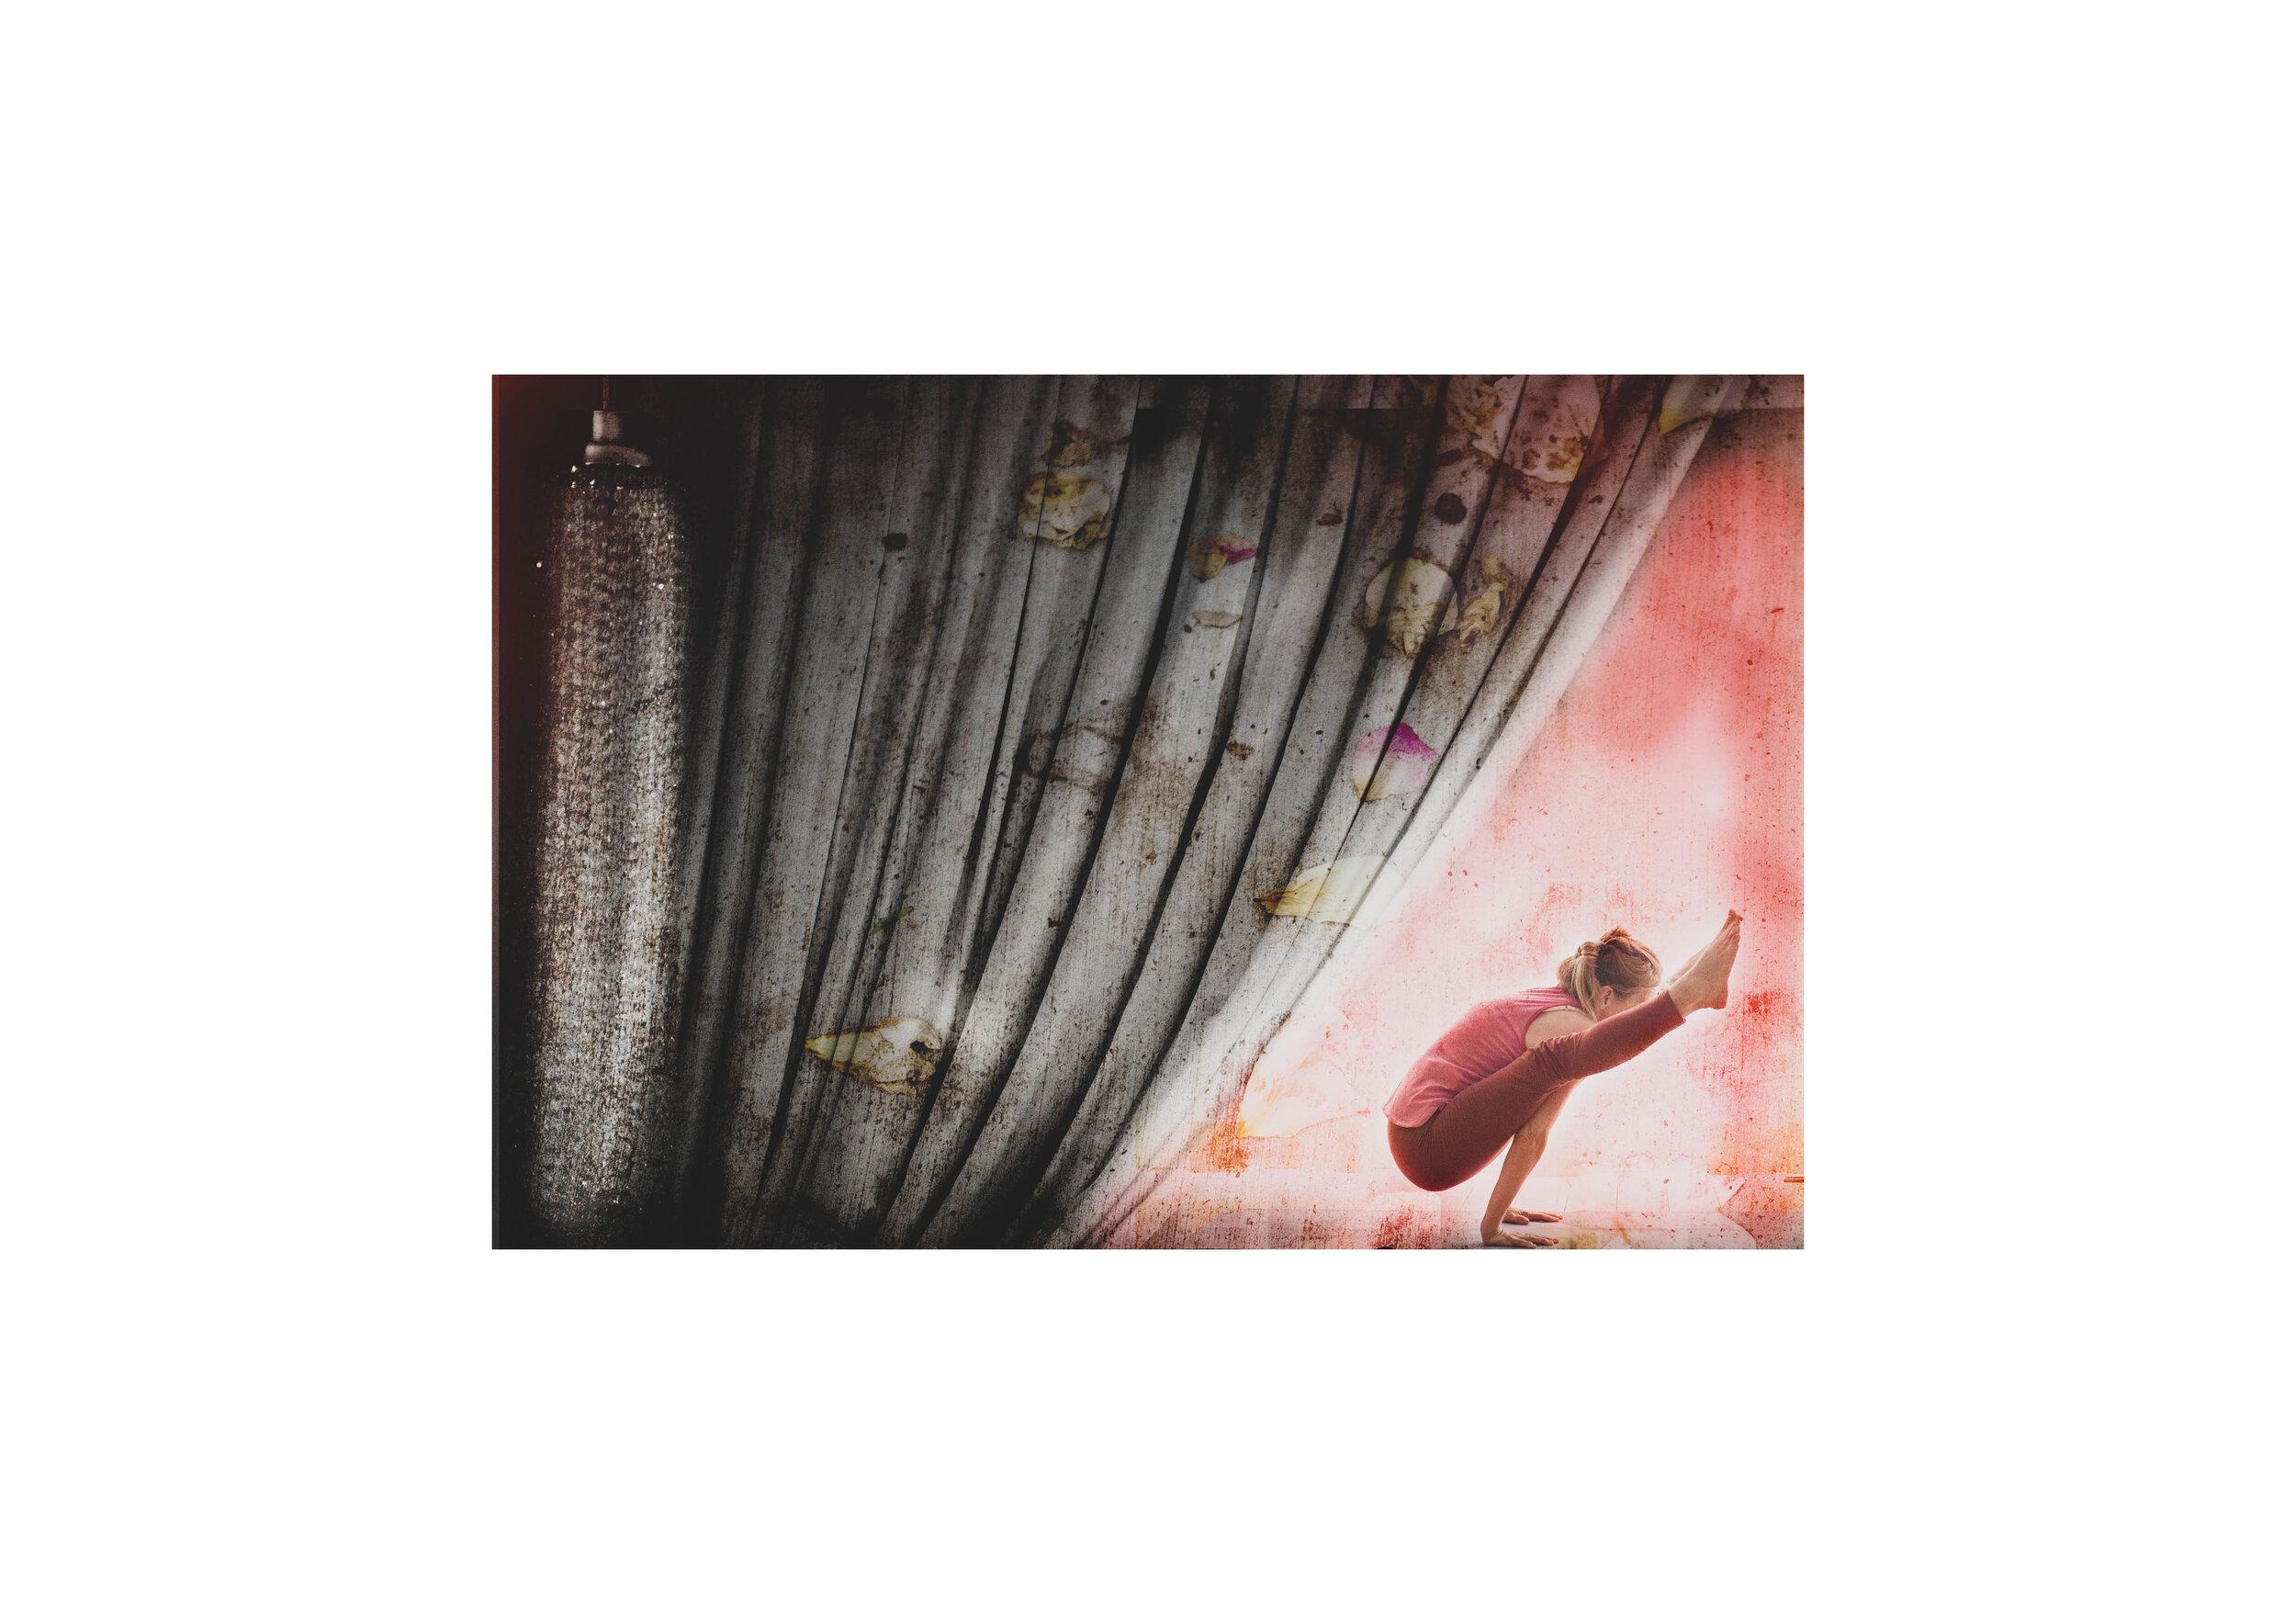 Tittibhasana behind the curtain